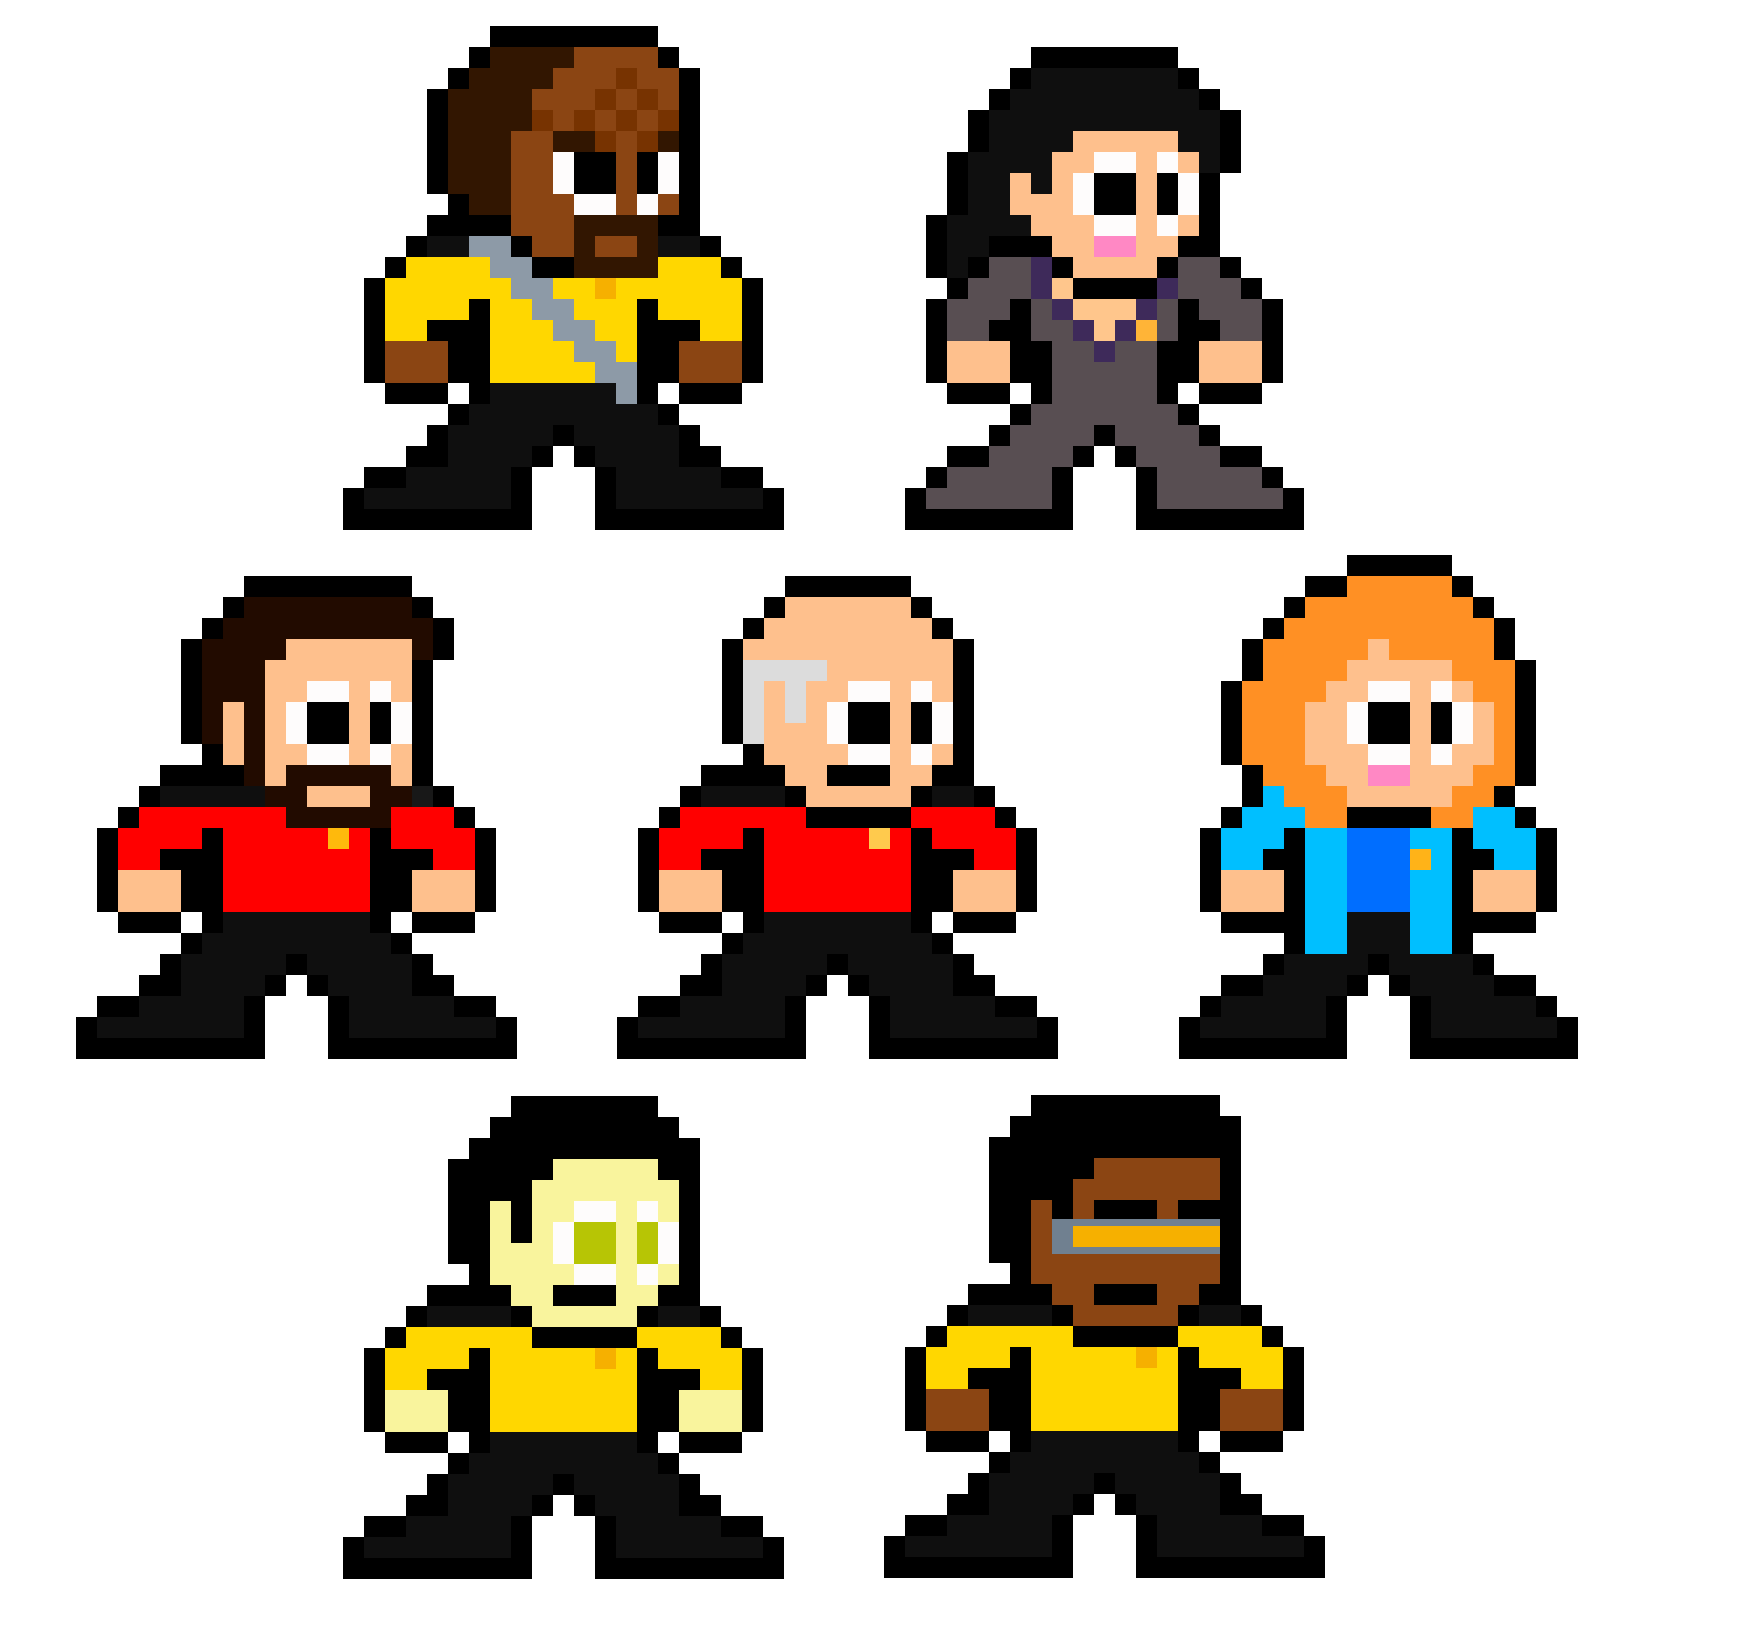 Star Trek: The Next Generation | Pixelated Pop Culture | Pinterest